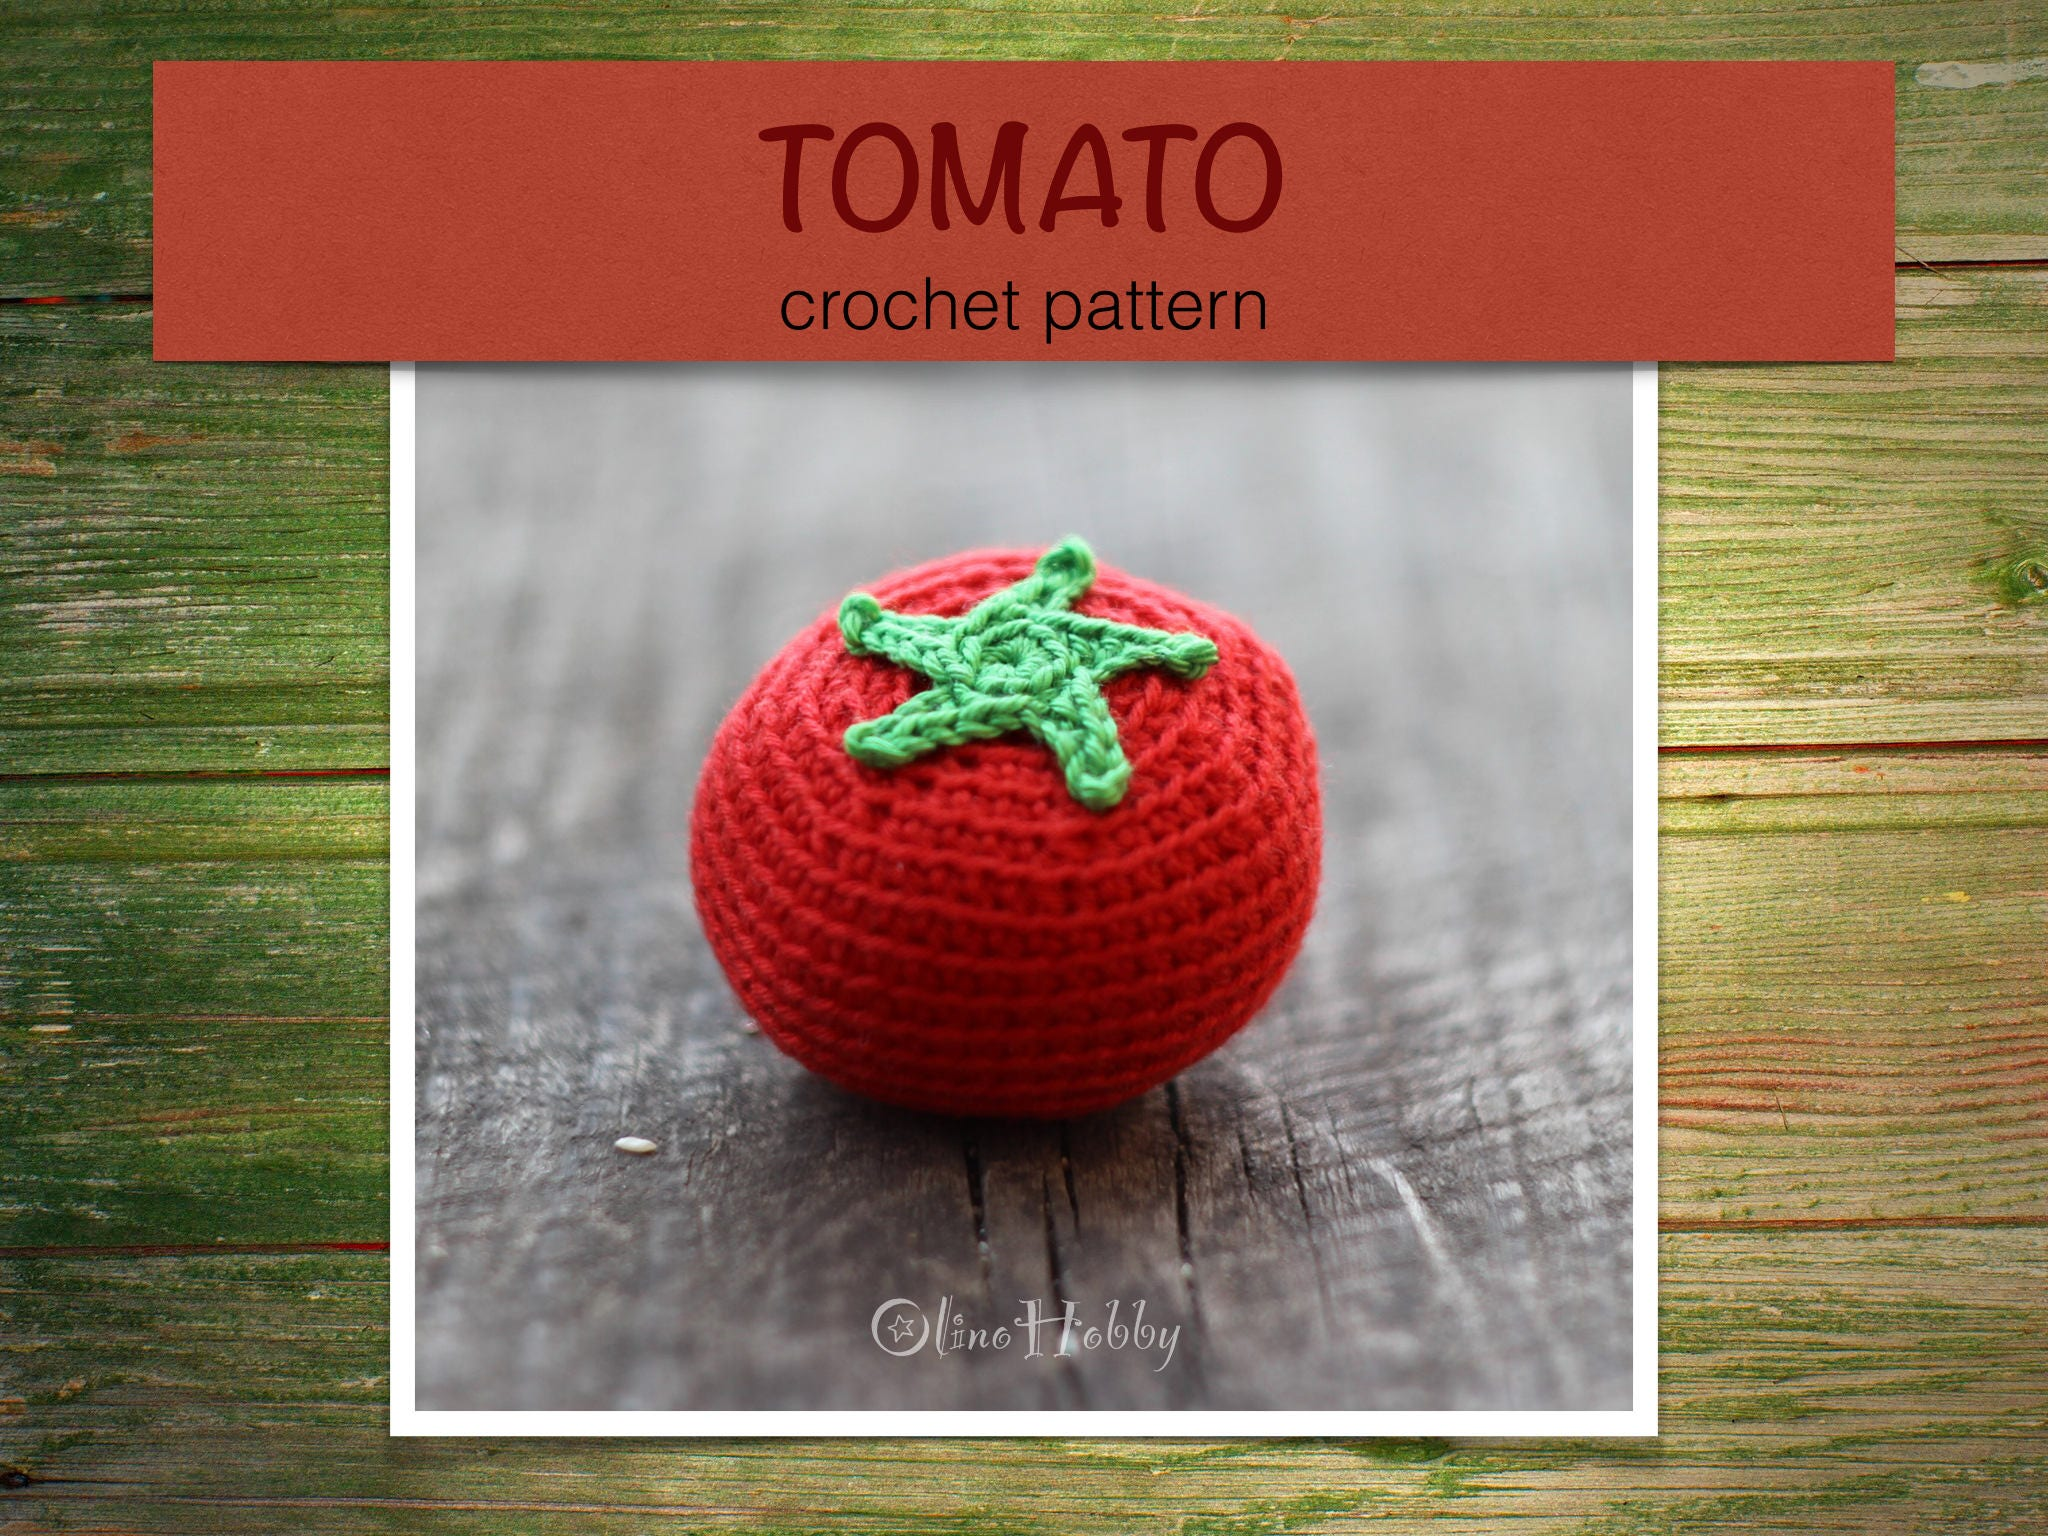 TOMATO Crochet Pattern PDF - Crochet tomato pattern Amigurumi tomato ...